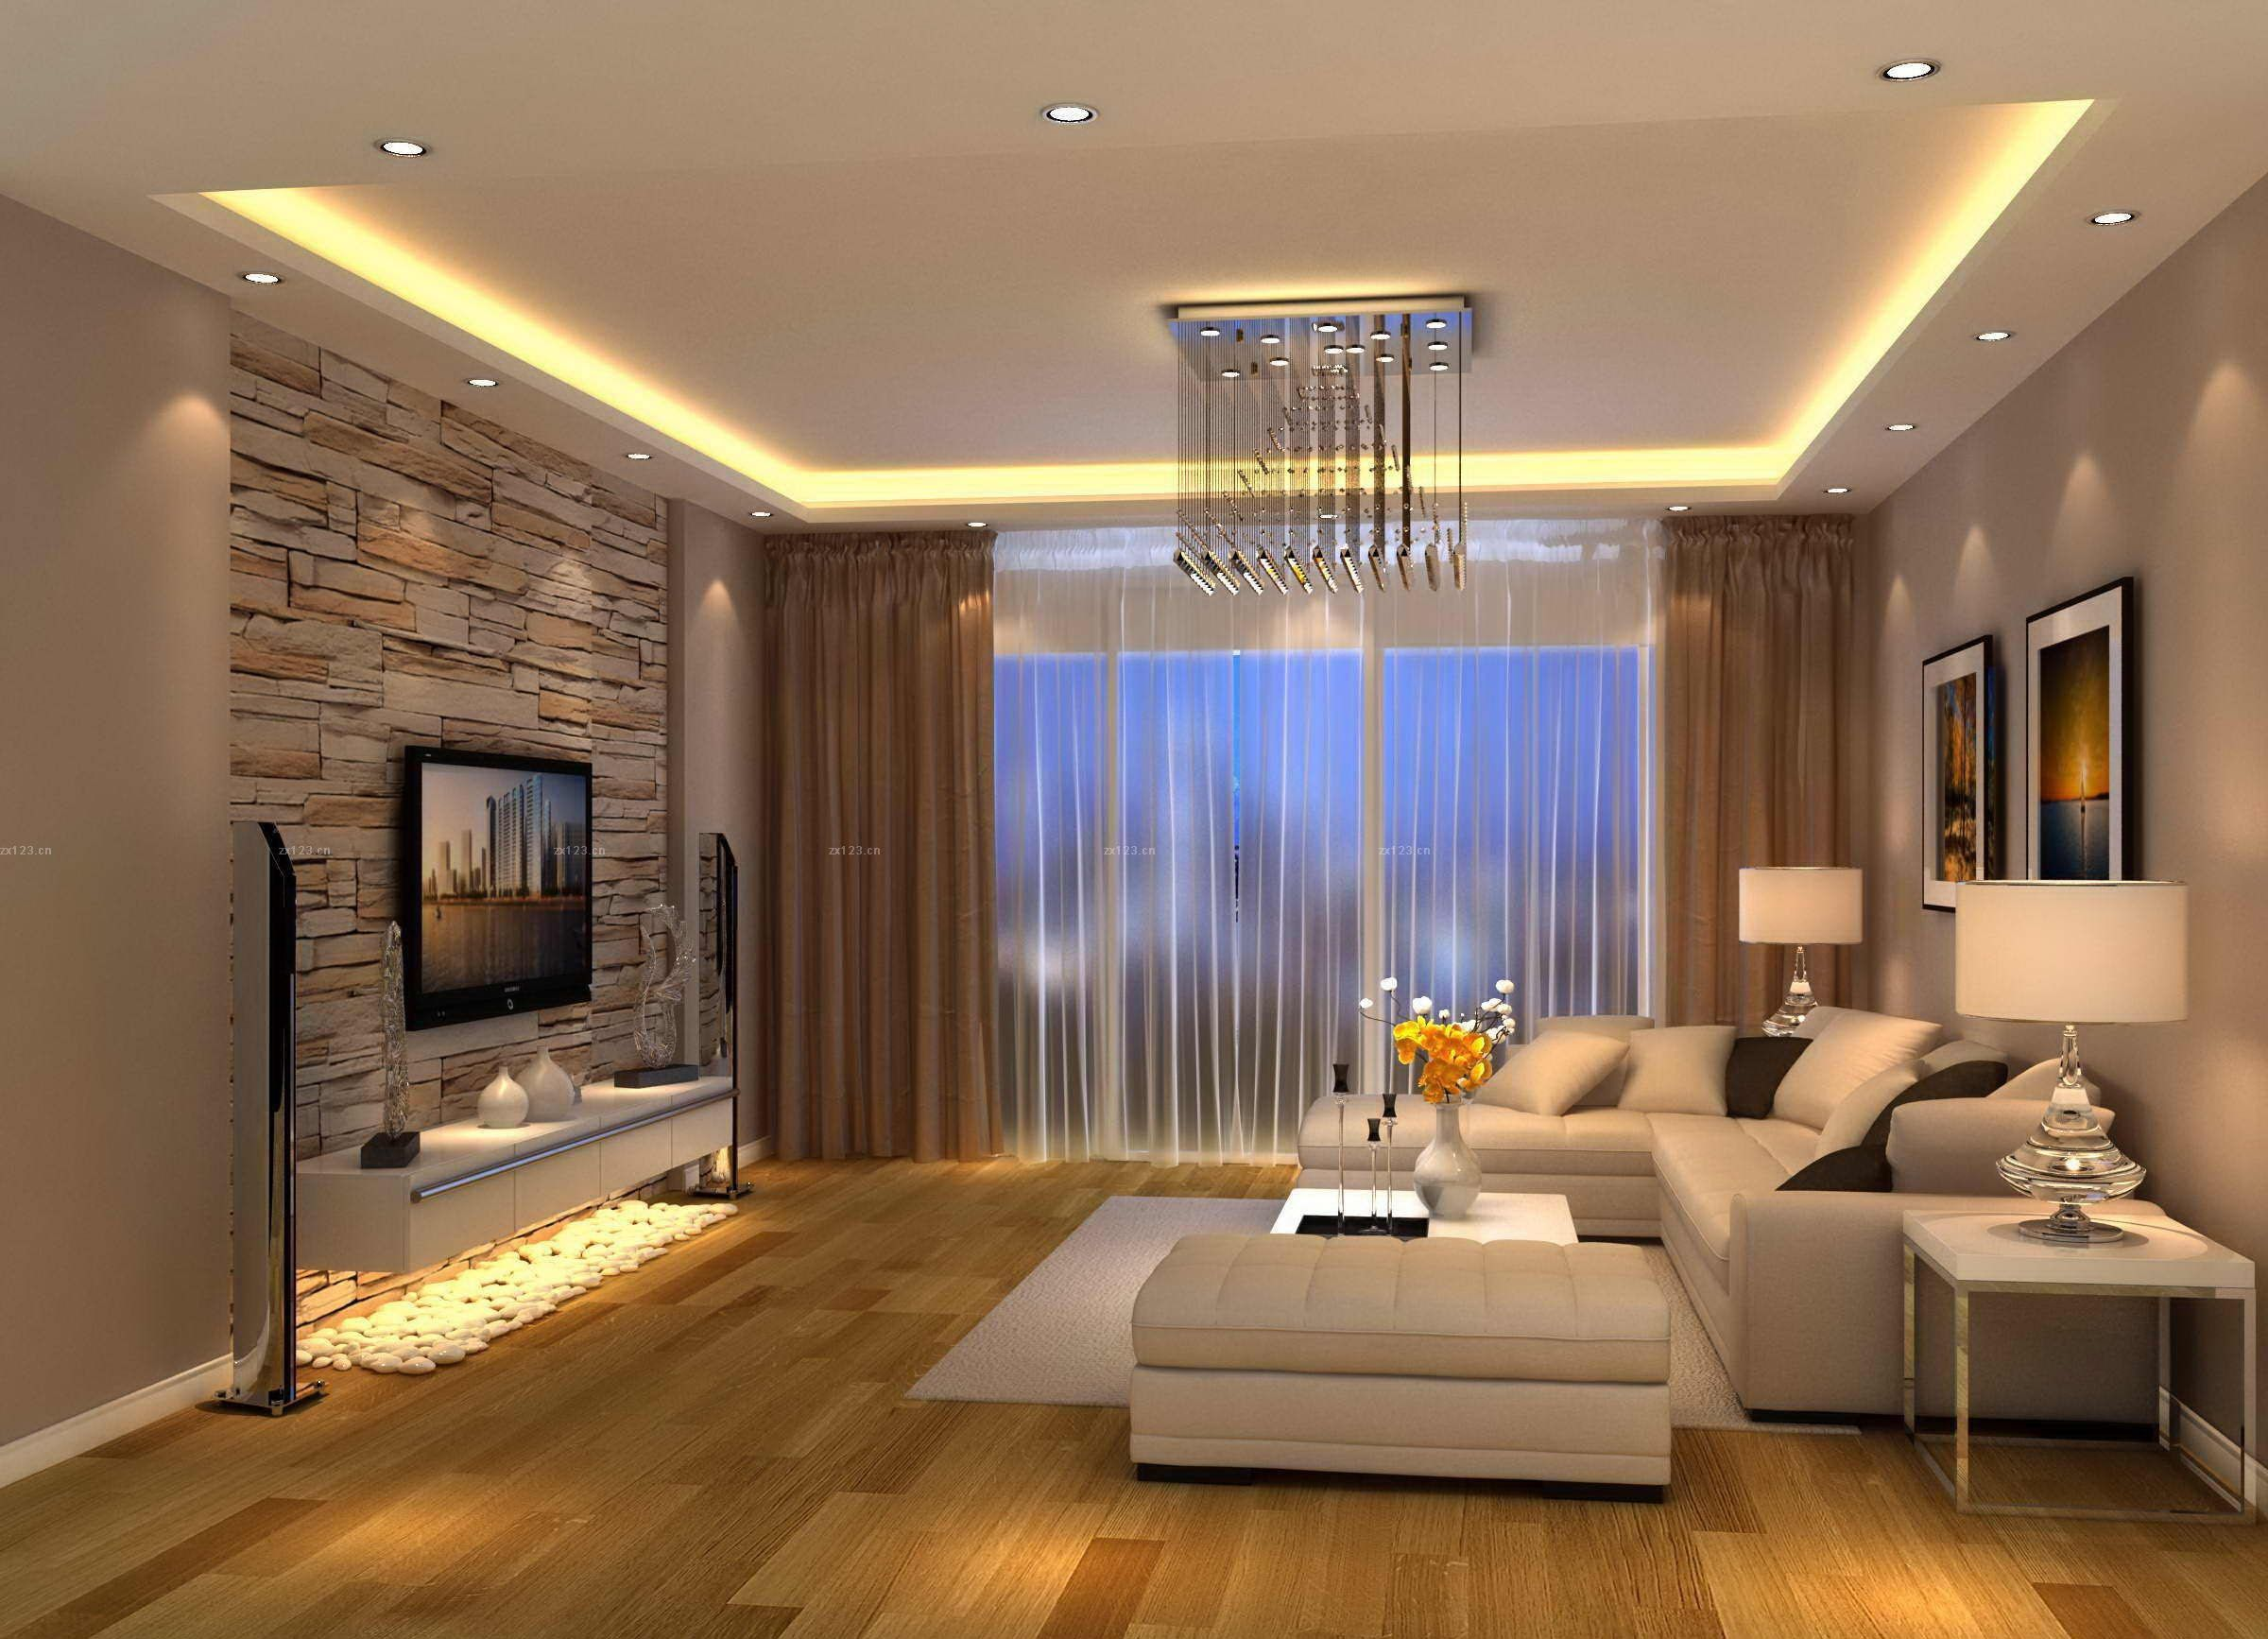 Fullsize Of Interior Design Images Living Room